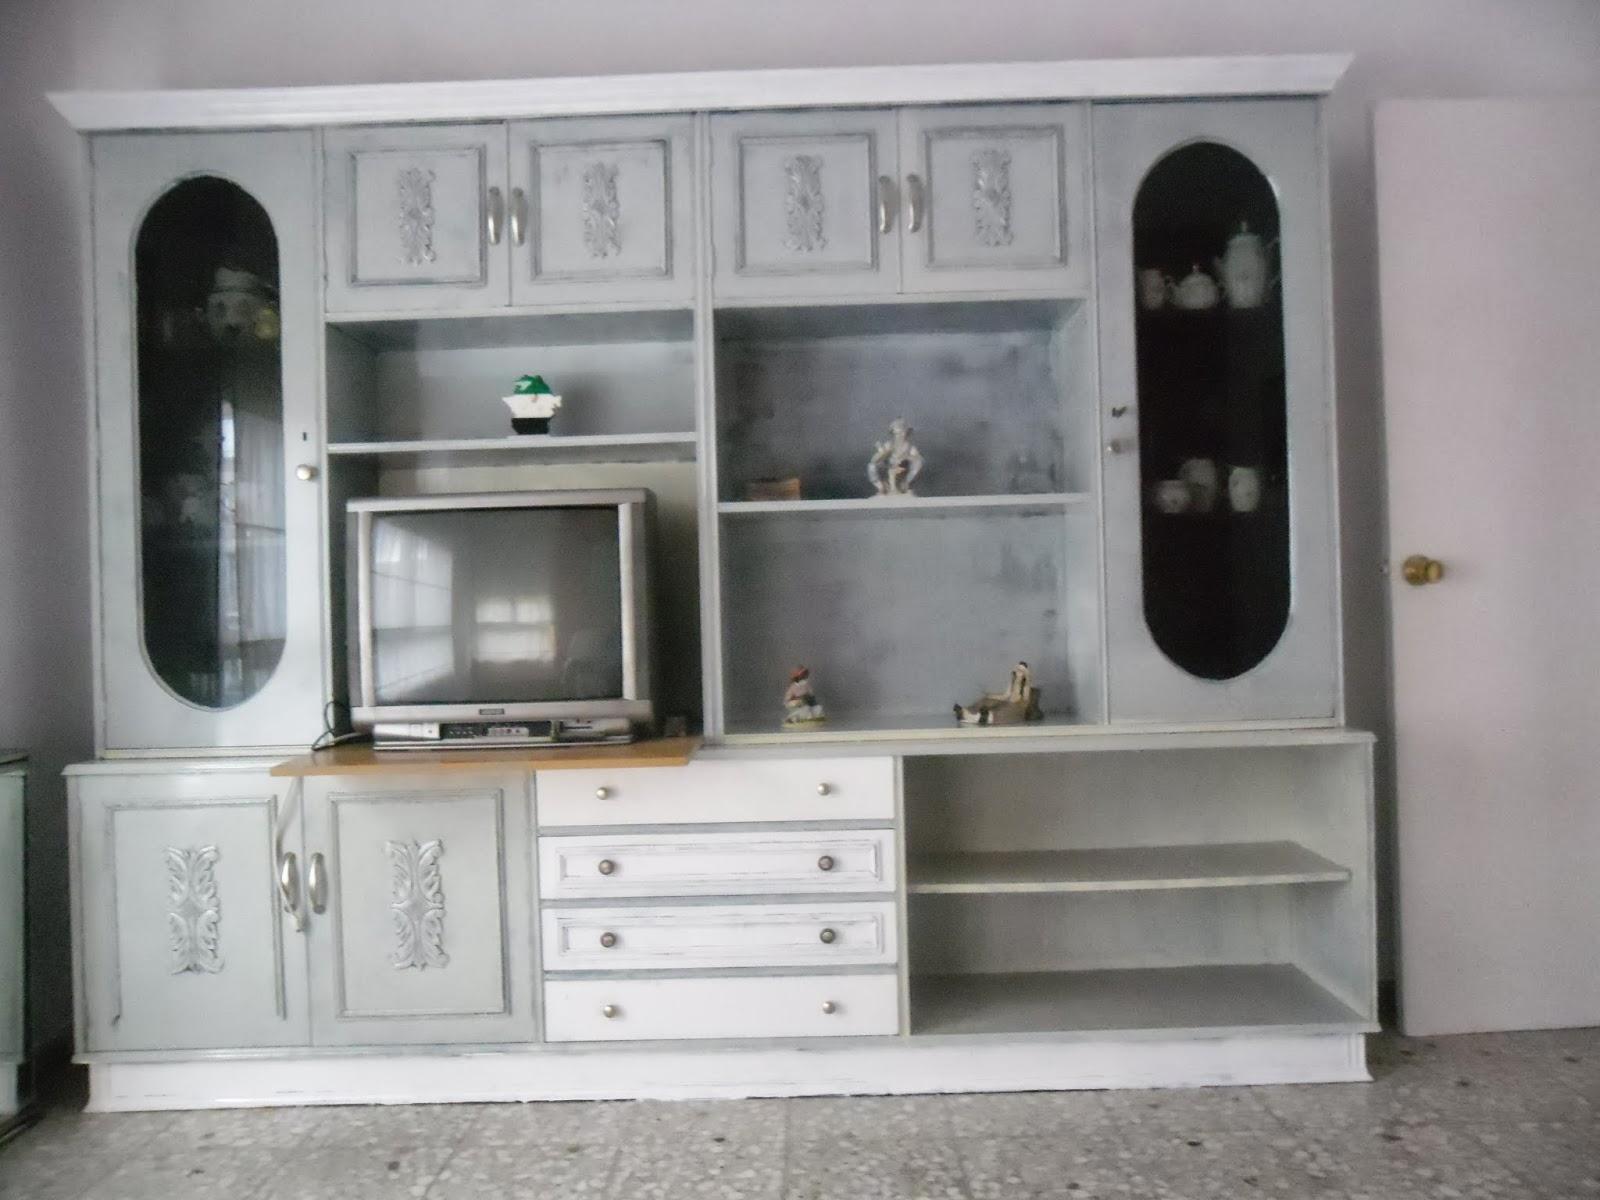 Restauraci n de muebles merceditas for Restauracion de muebles